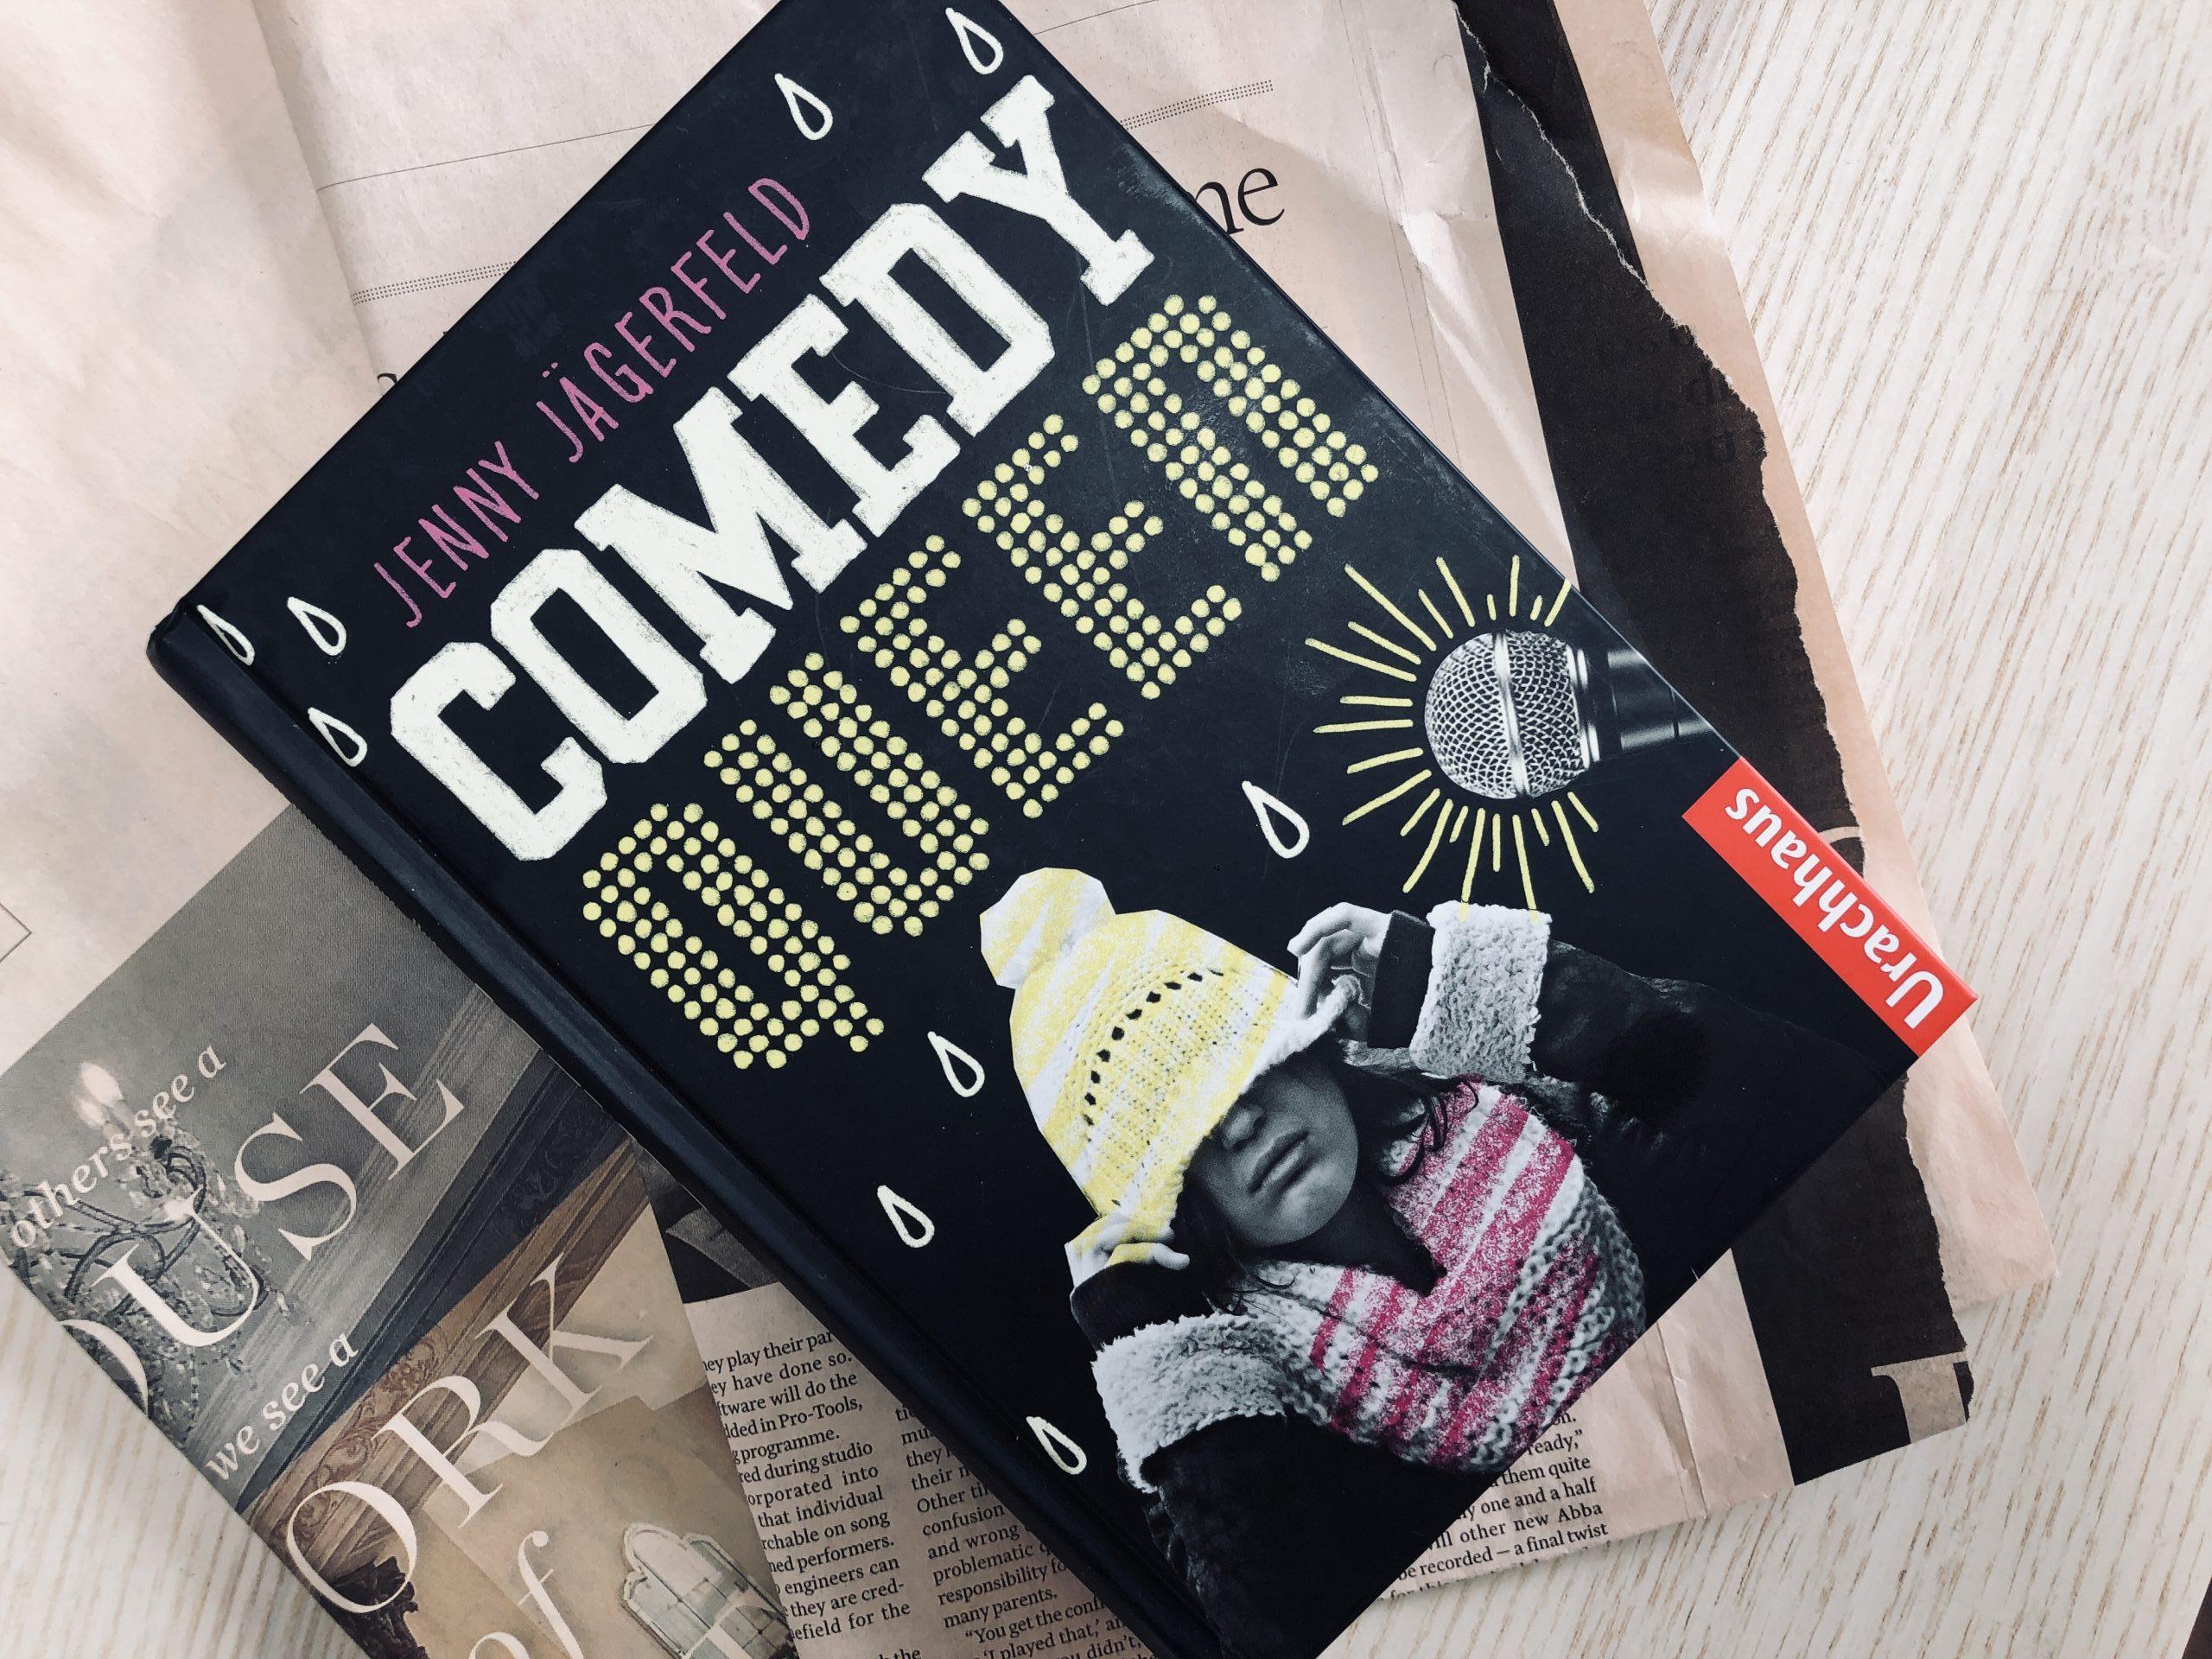 Jenny Jägerfeld: Comedy Queen